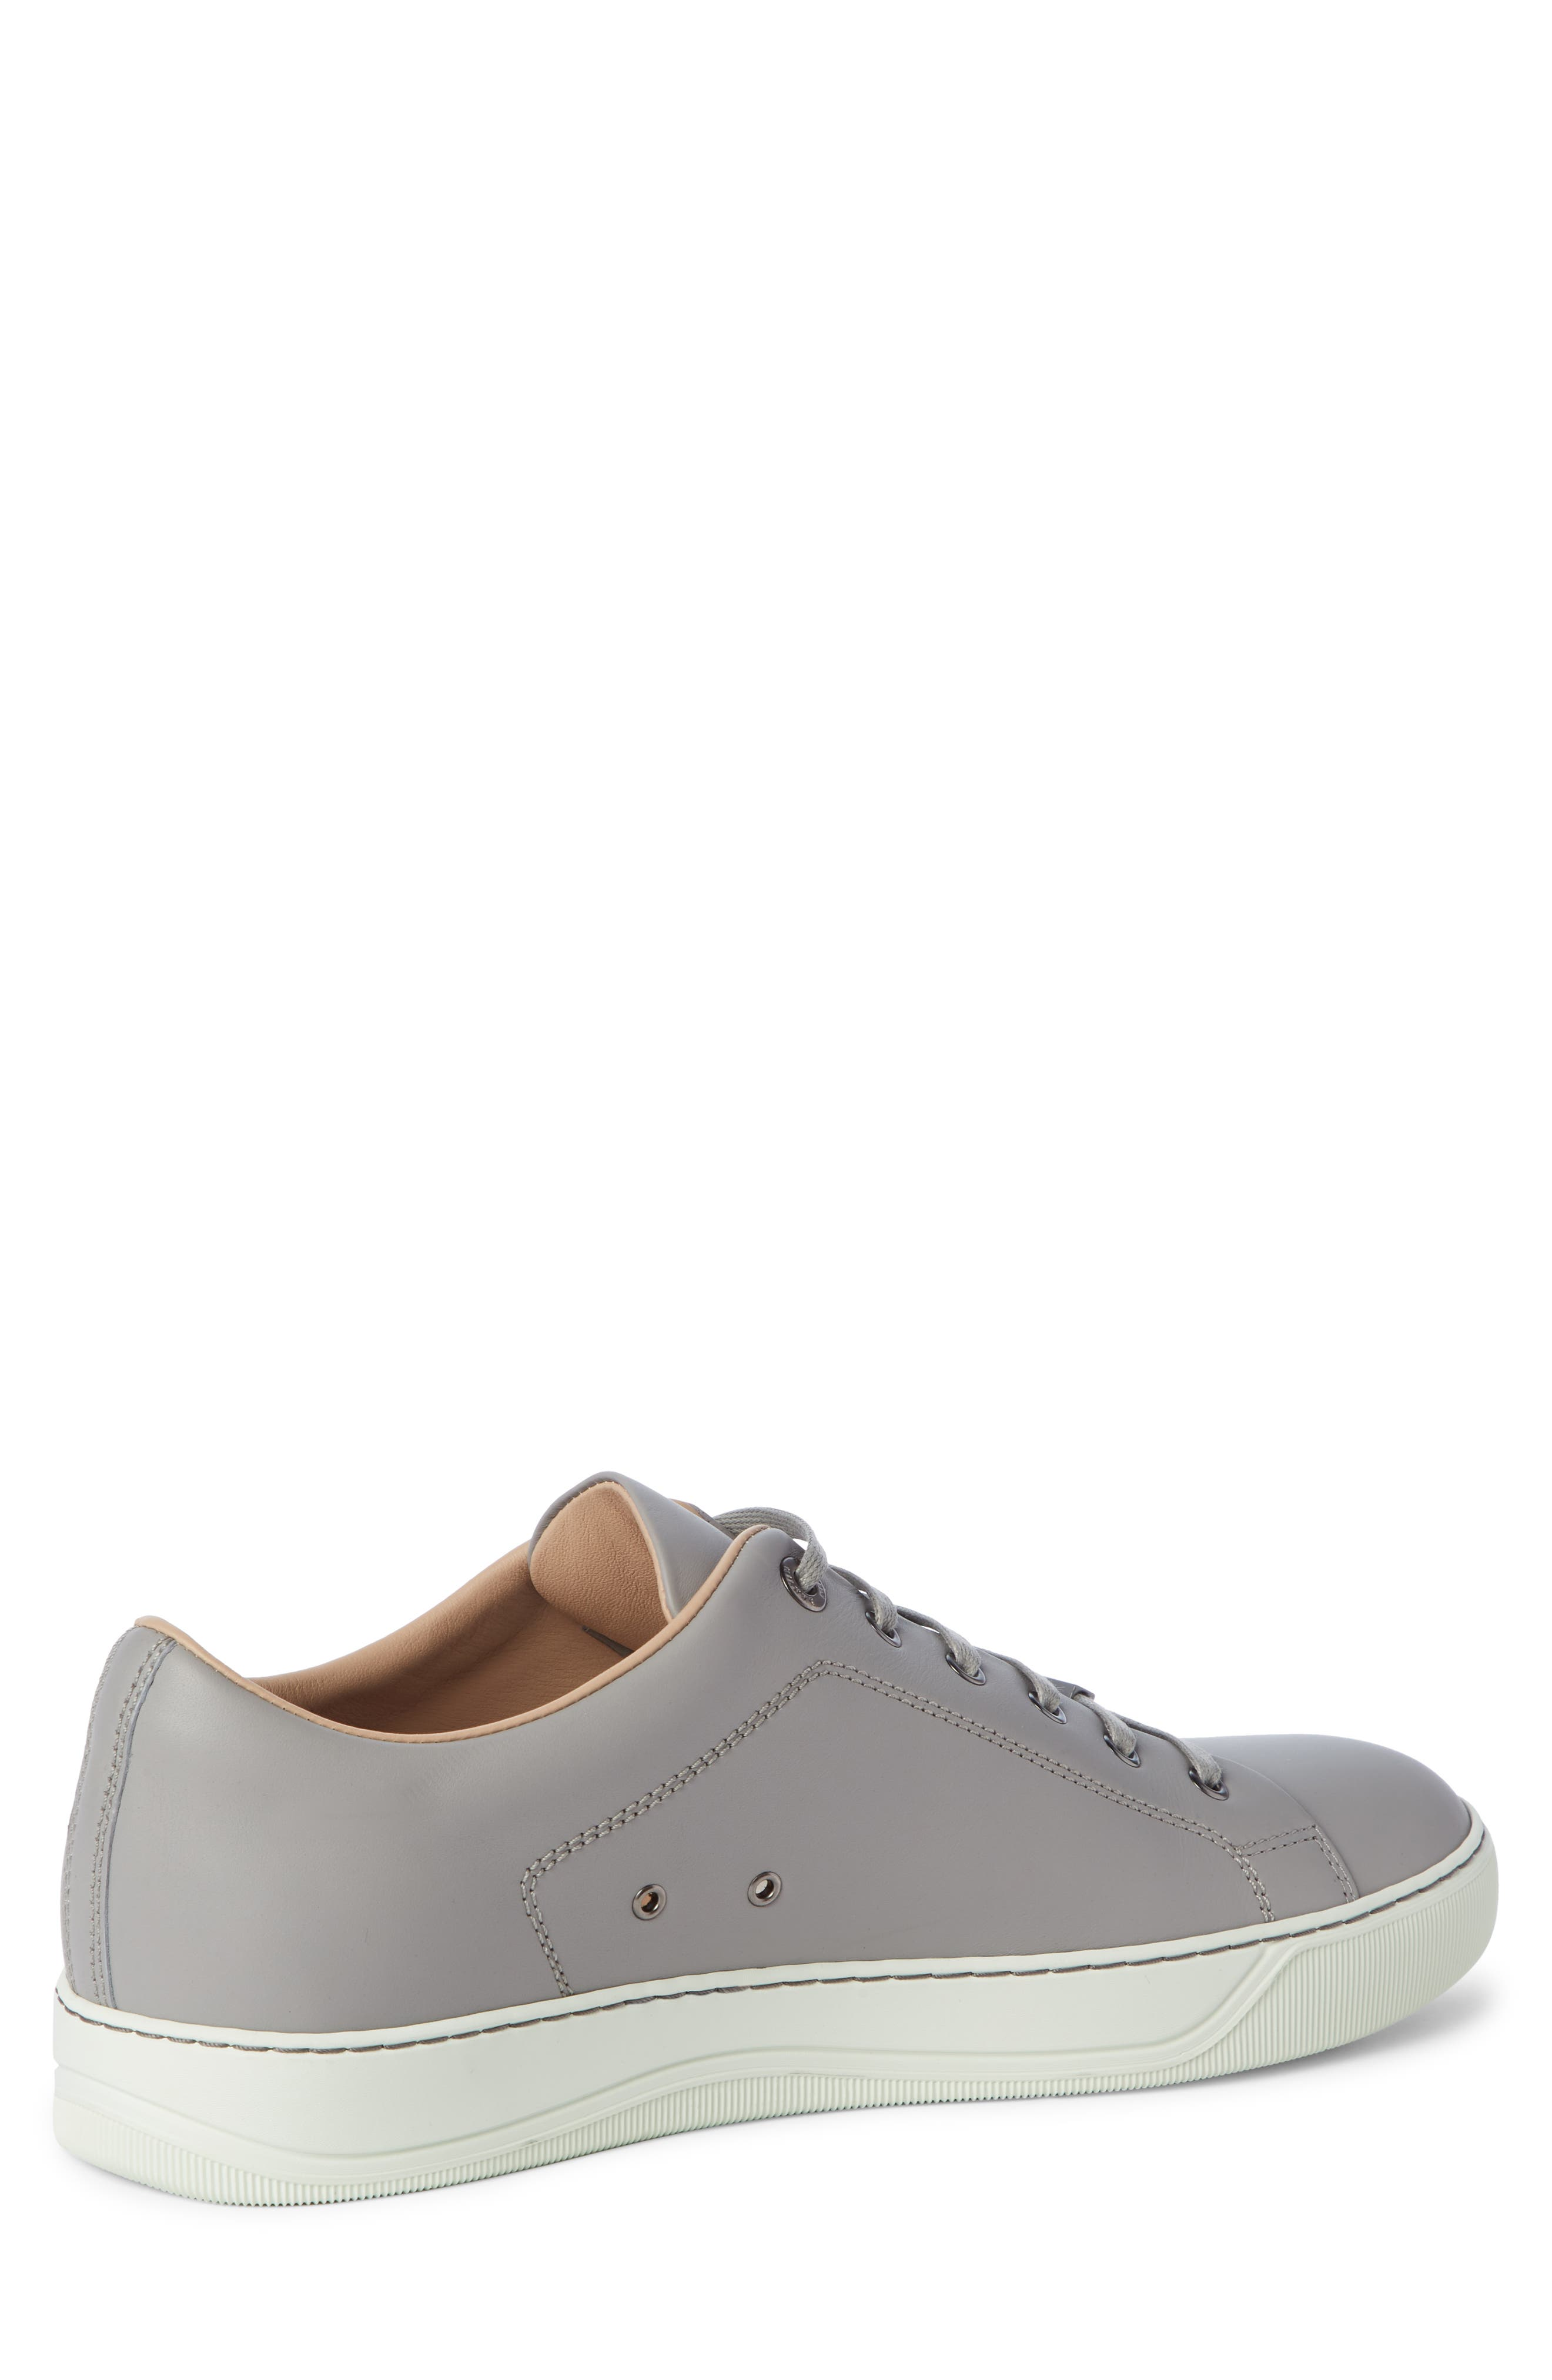 Frye Nappa Sneaker,                             Alternate thumbnail 2, color,                             022